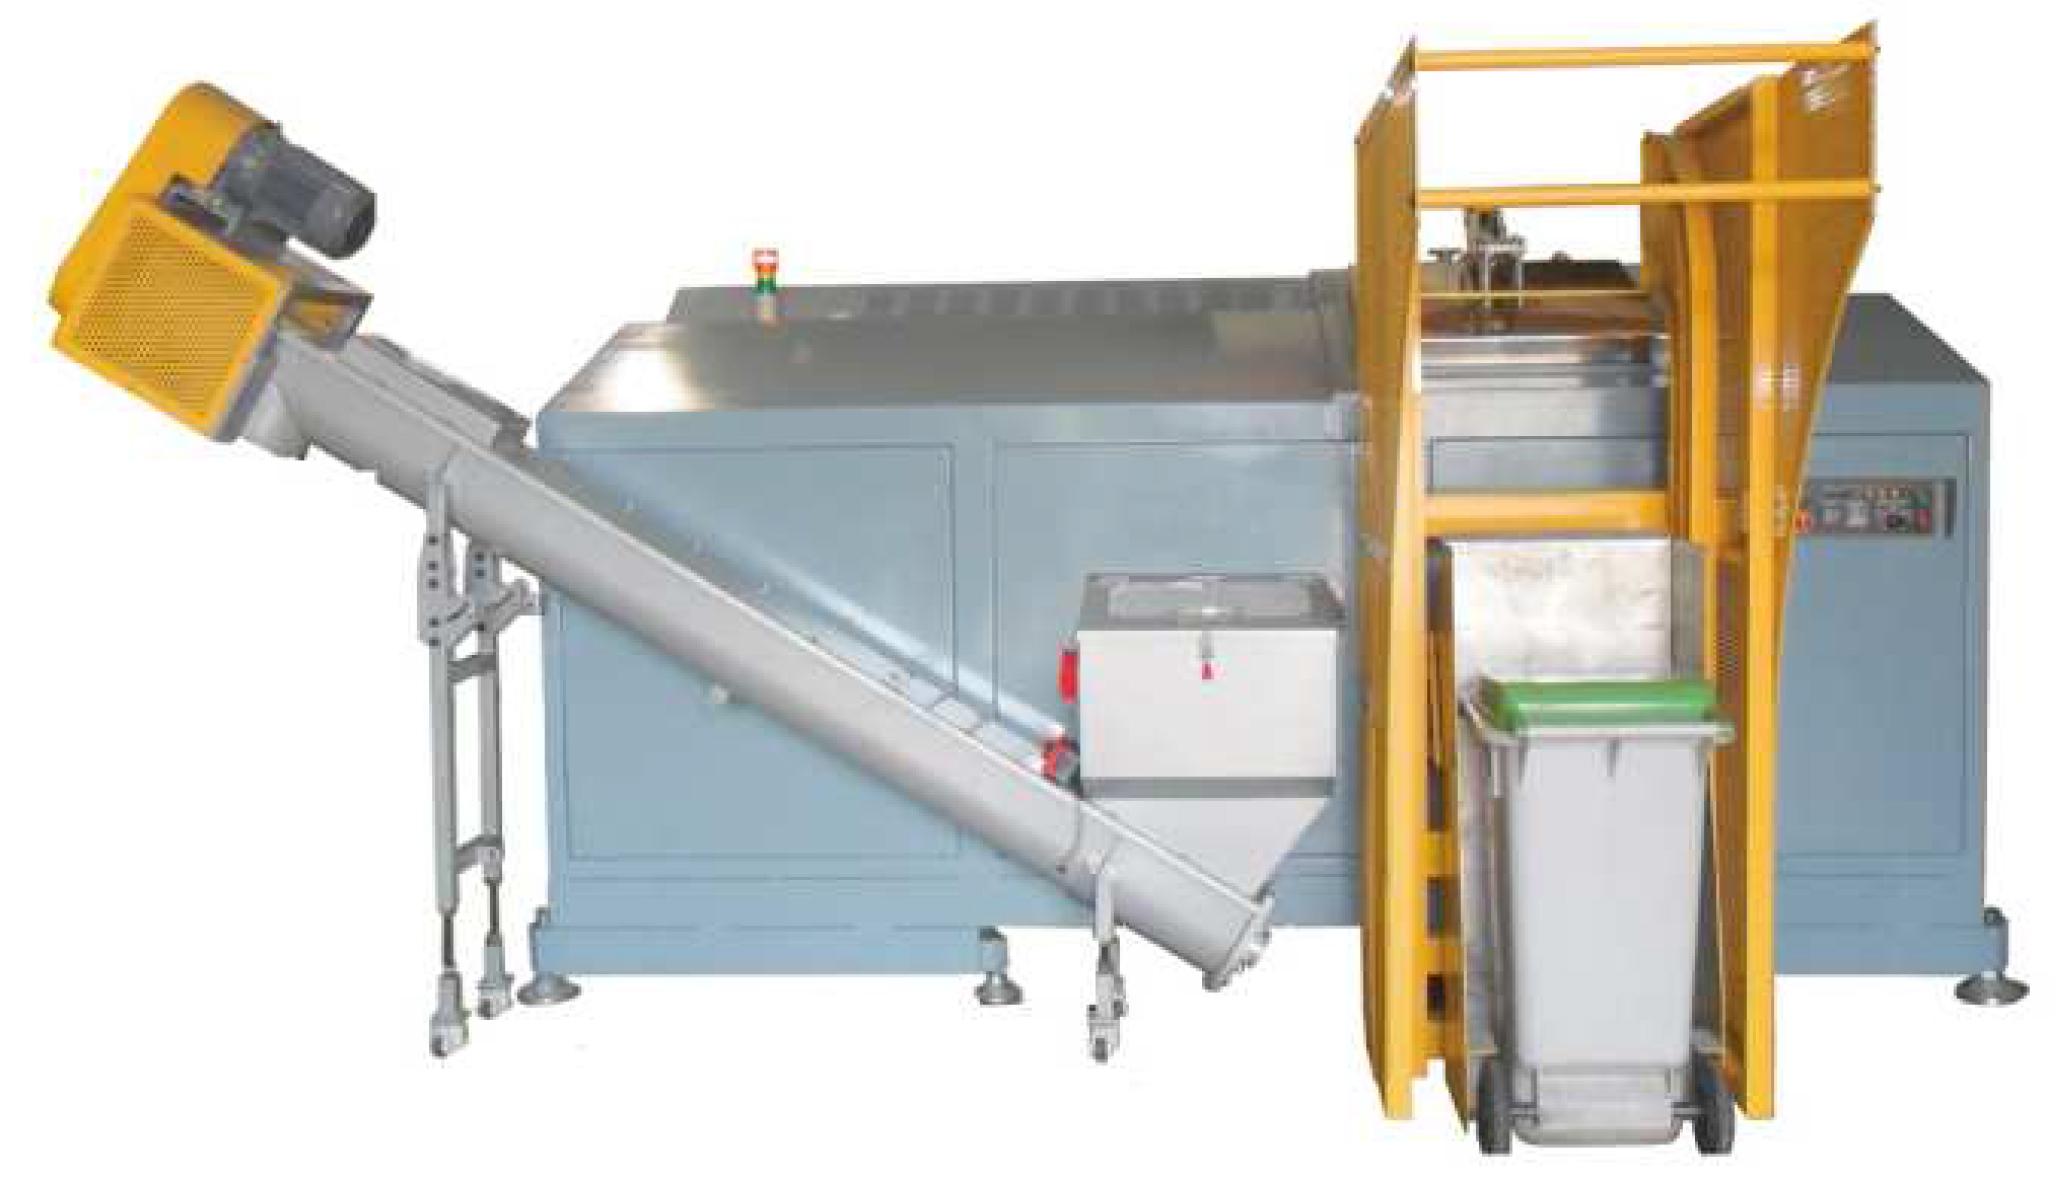 mws1200 - Residuo orgánico industrial